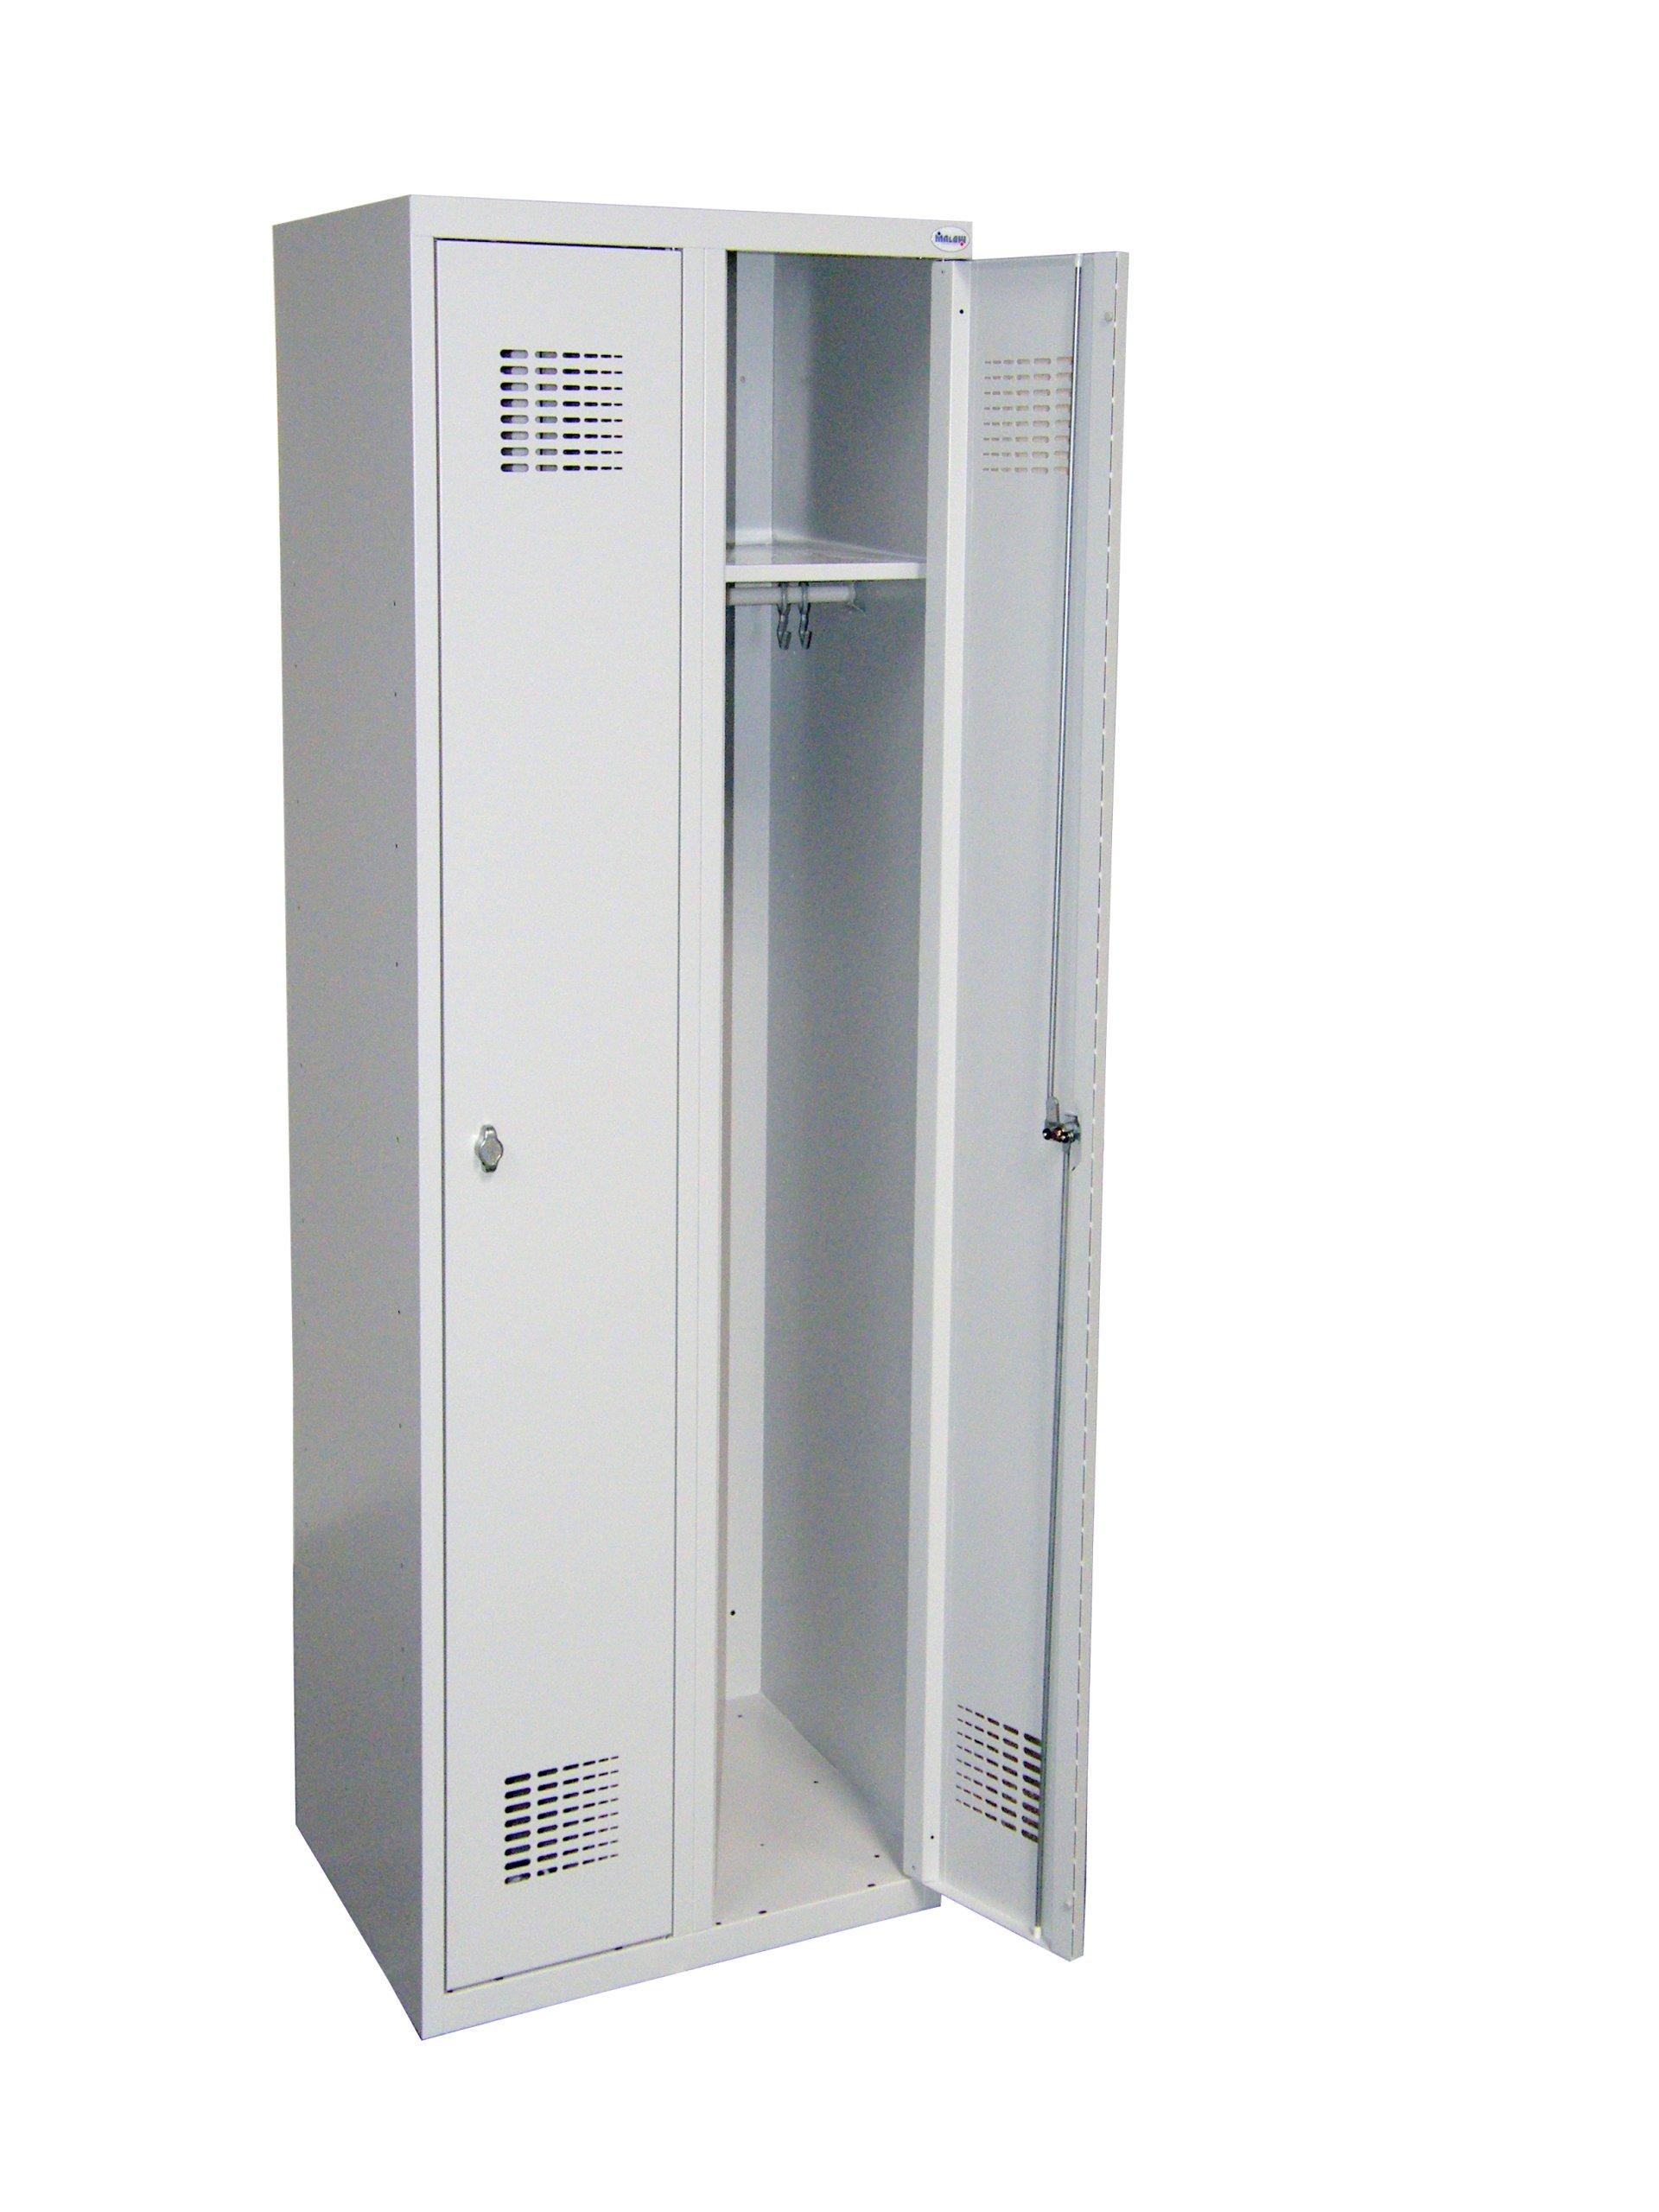 Шкаф металлический шкаф ??? одежды Sum320W мебелью охраны ТРУДА, социал